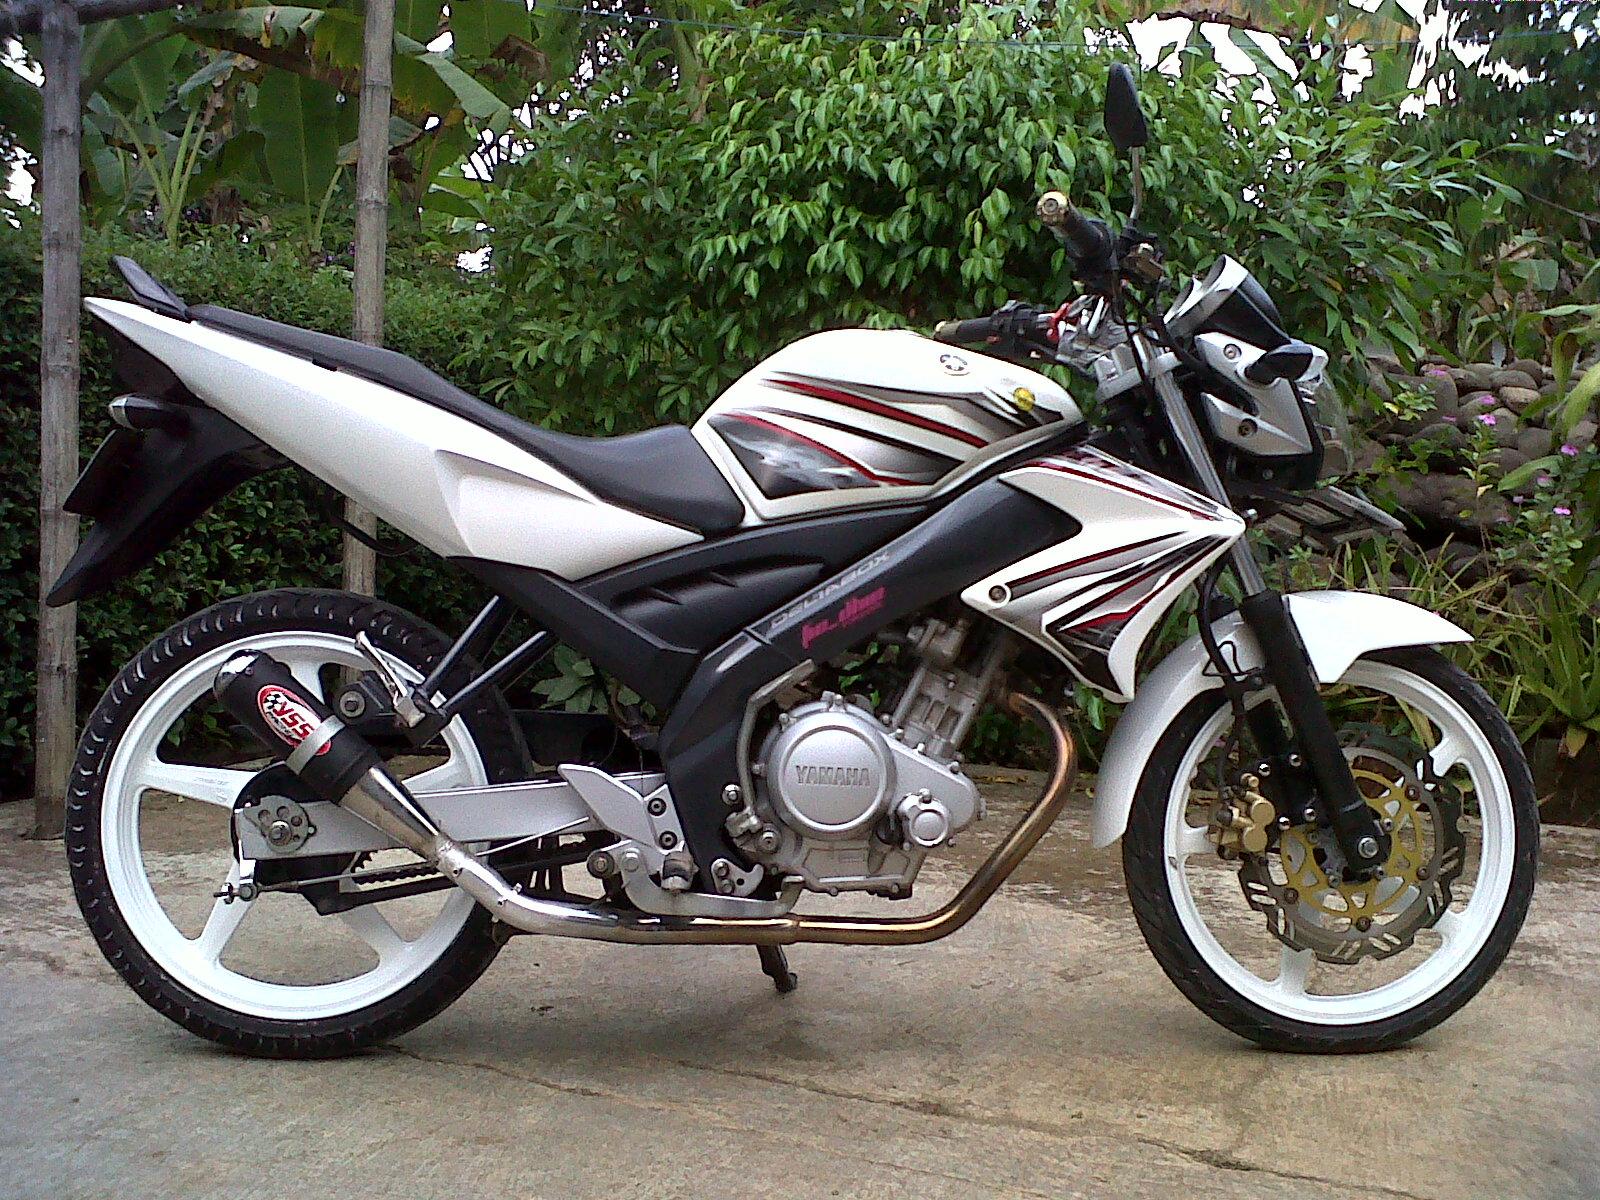 Gambar Modifikasi Motor Yamaha Vixion Terbaru 2013